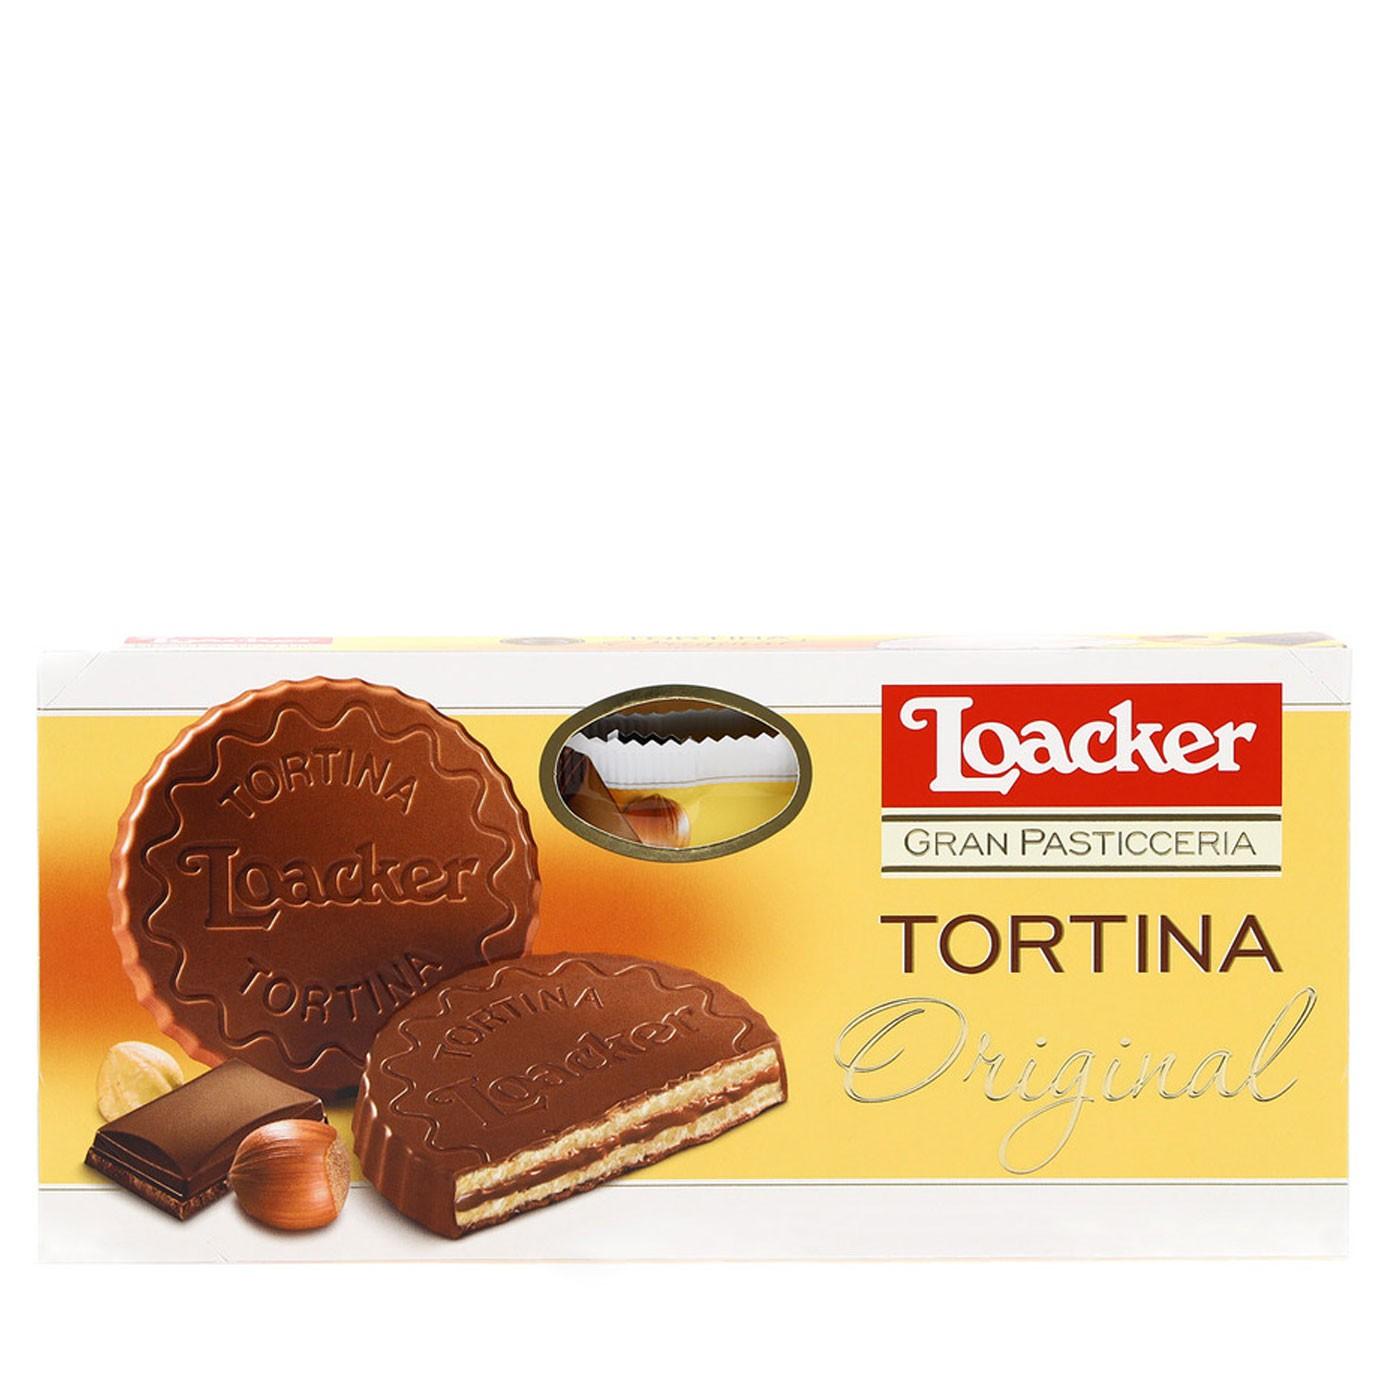 Gran Pasticcera: Tortina Original 4.4 oz